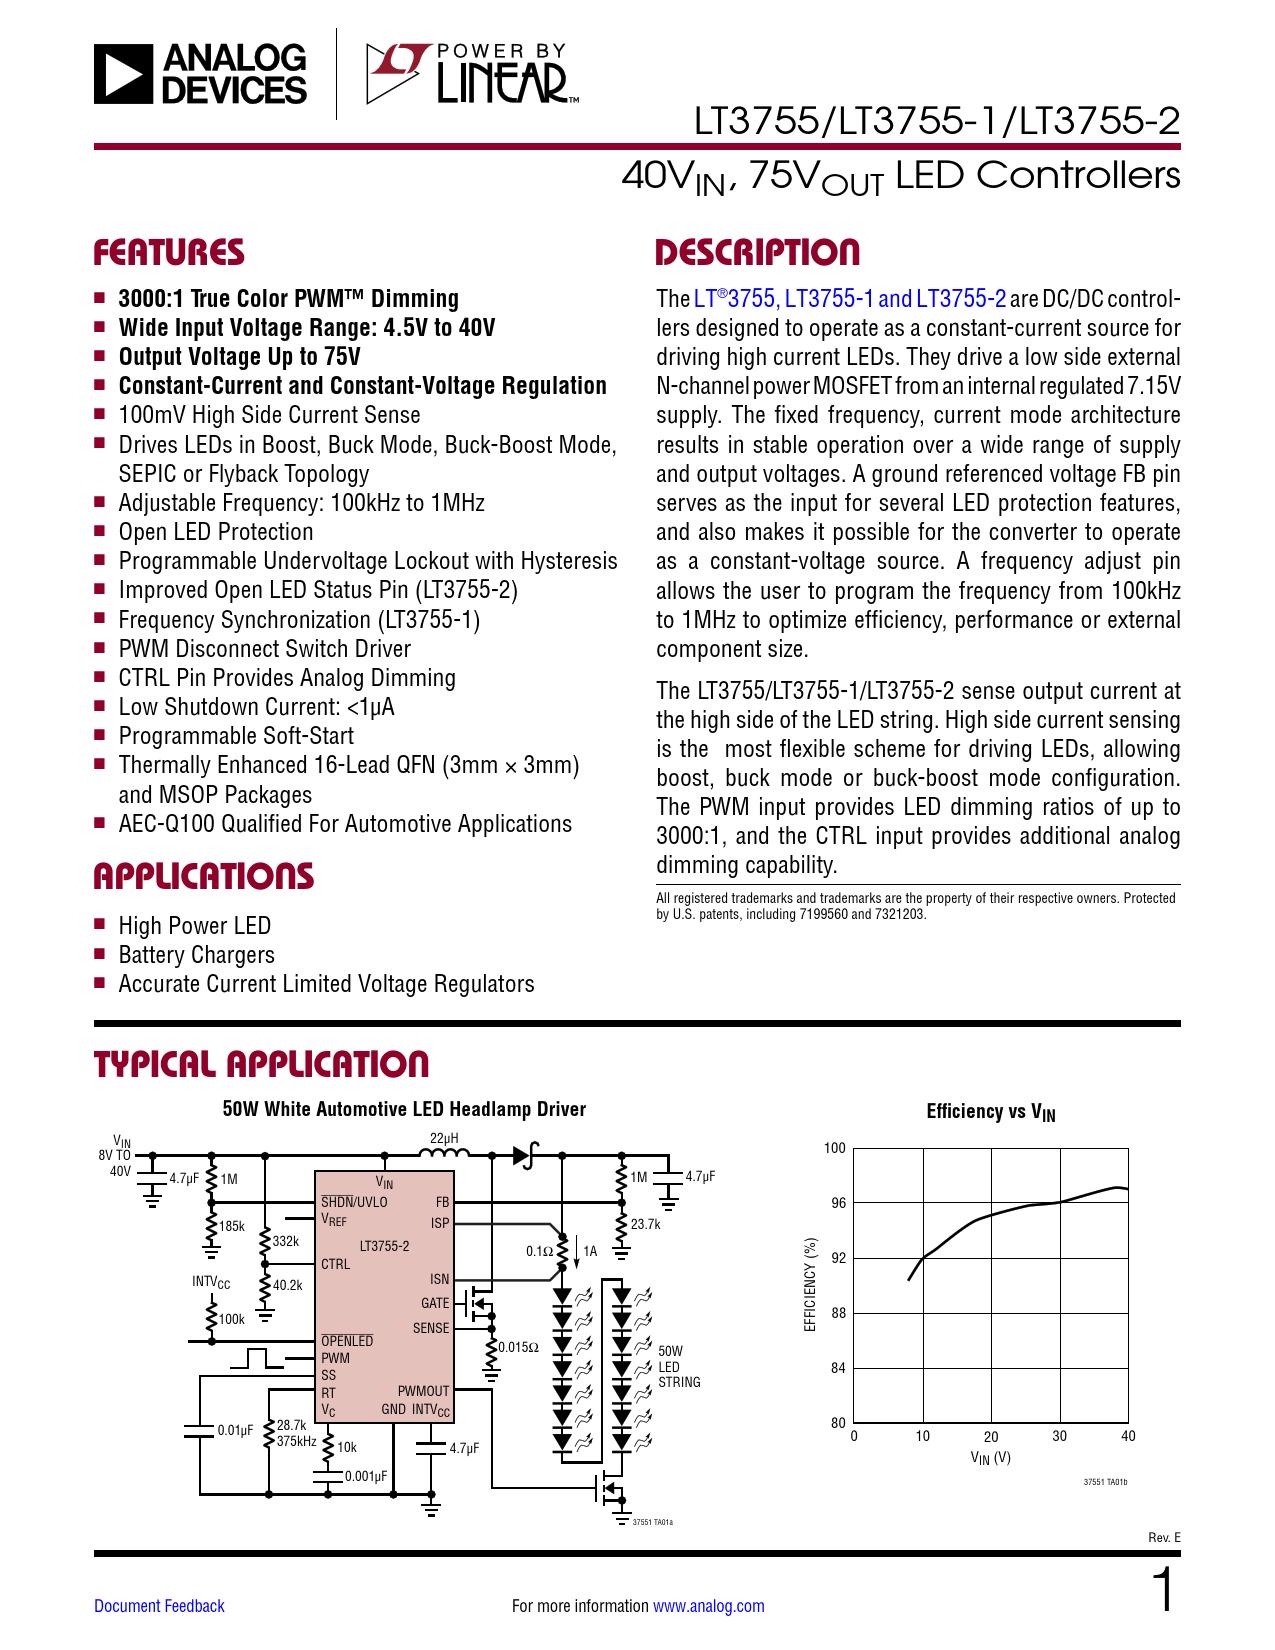 Datasheet LT3755, LT3755-1, LT3755-2 Analog Devices, Версия: E